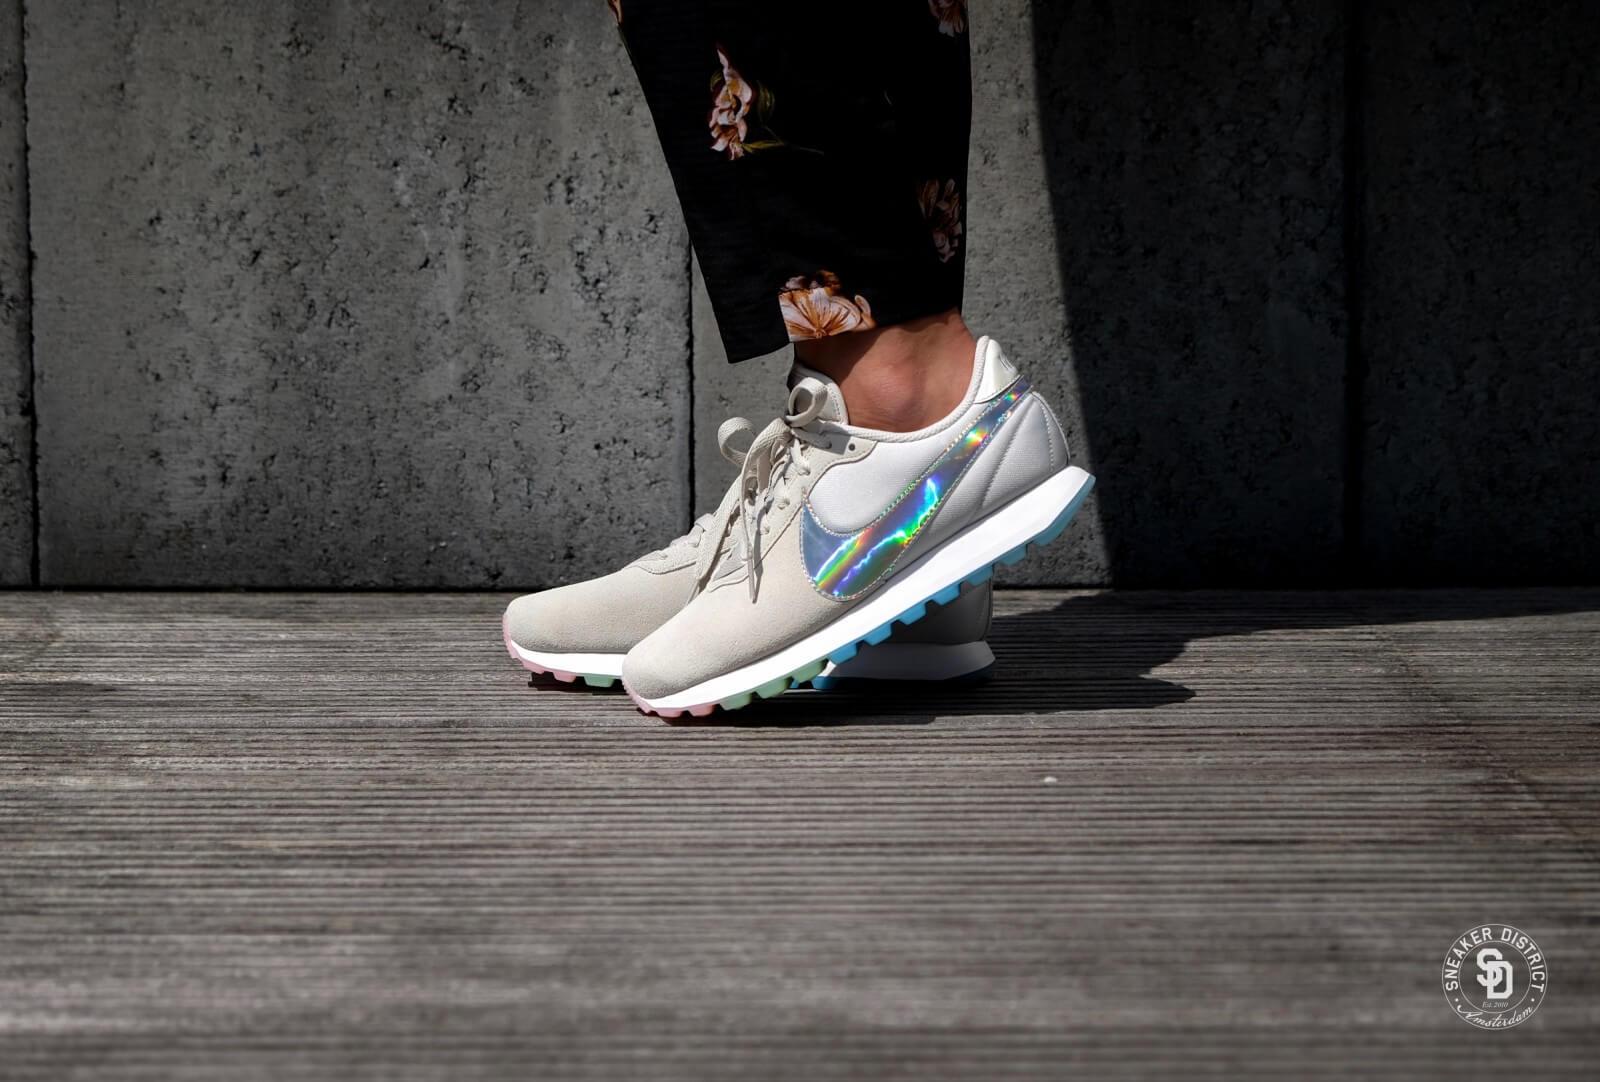 Nike Women's Pre-Love o.x. Summit White